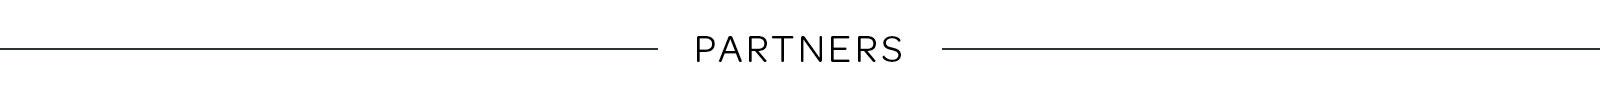 partner-logos-missouri-cannabis-events.jpg